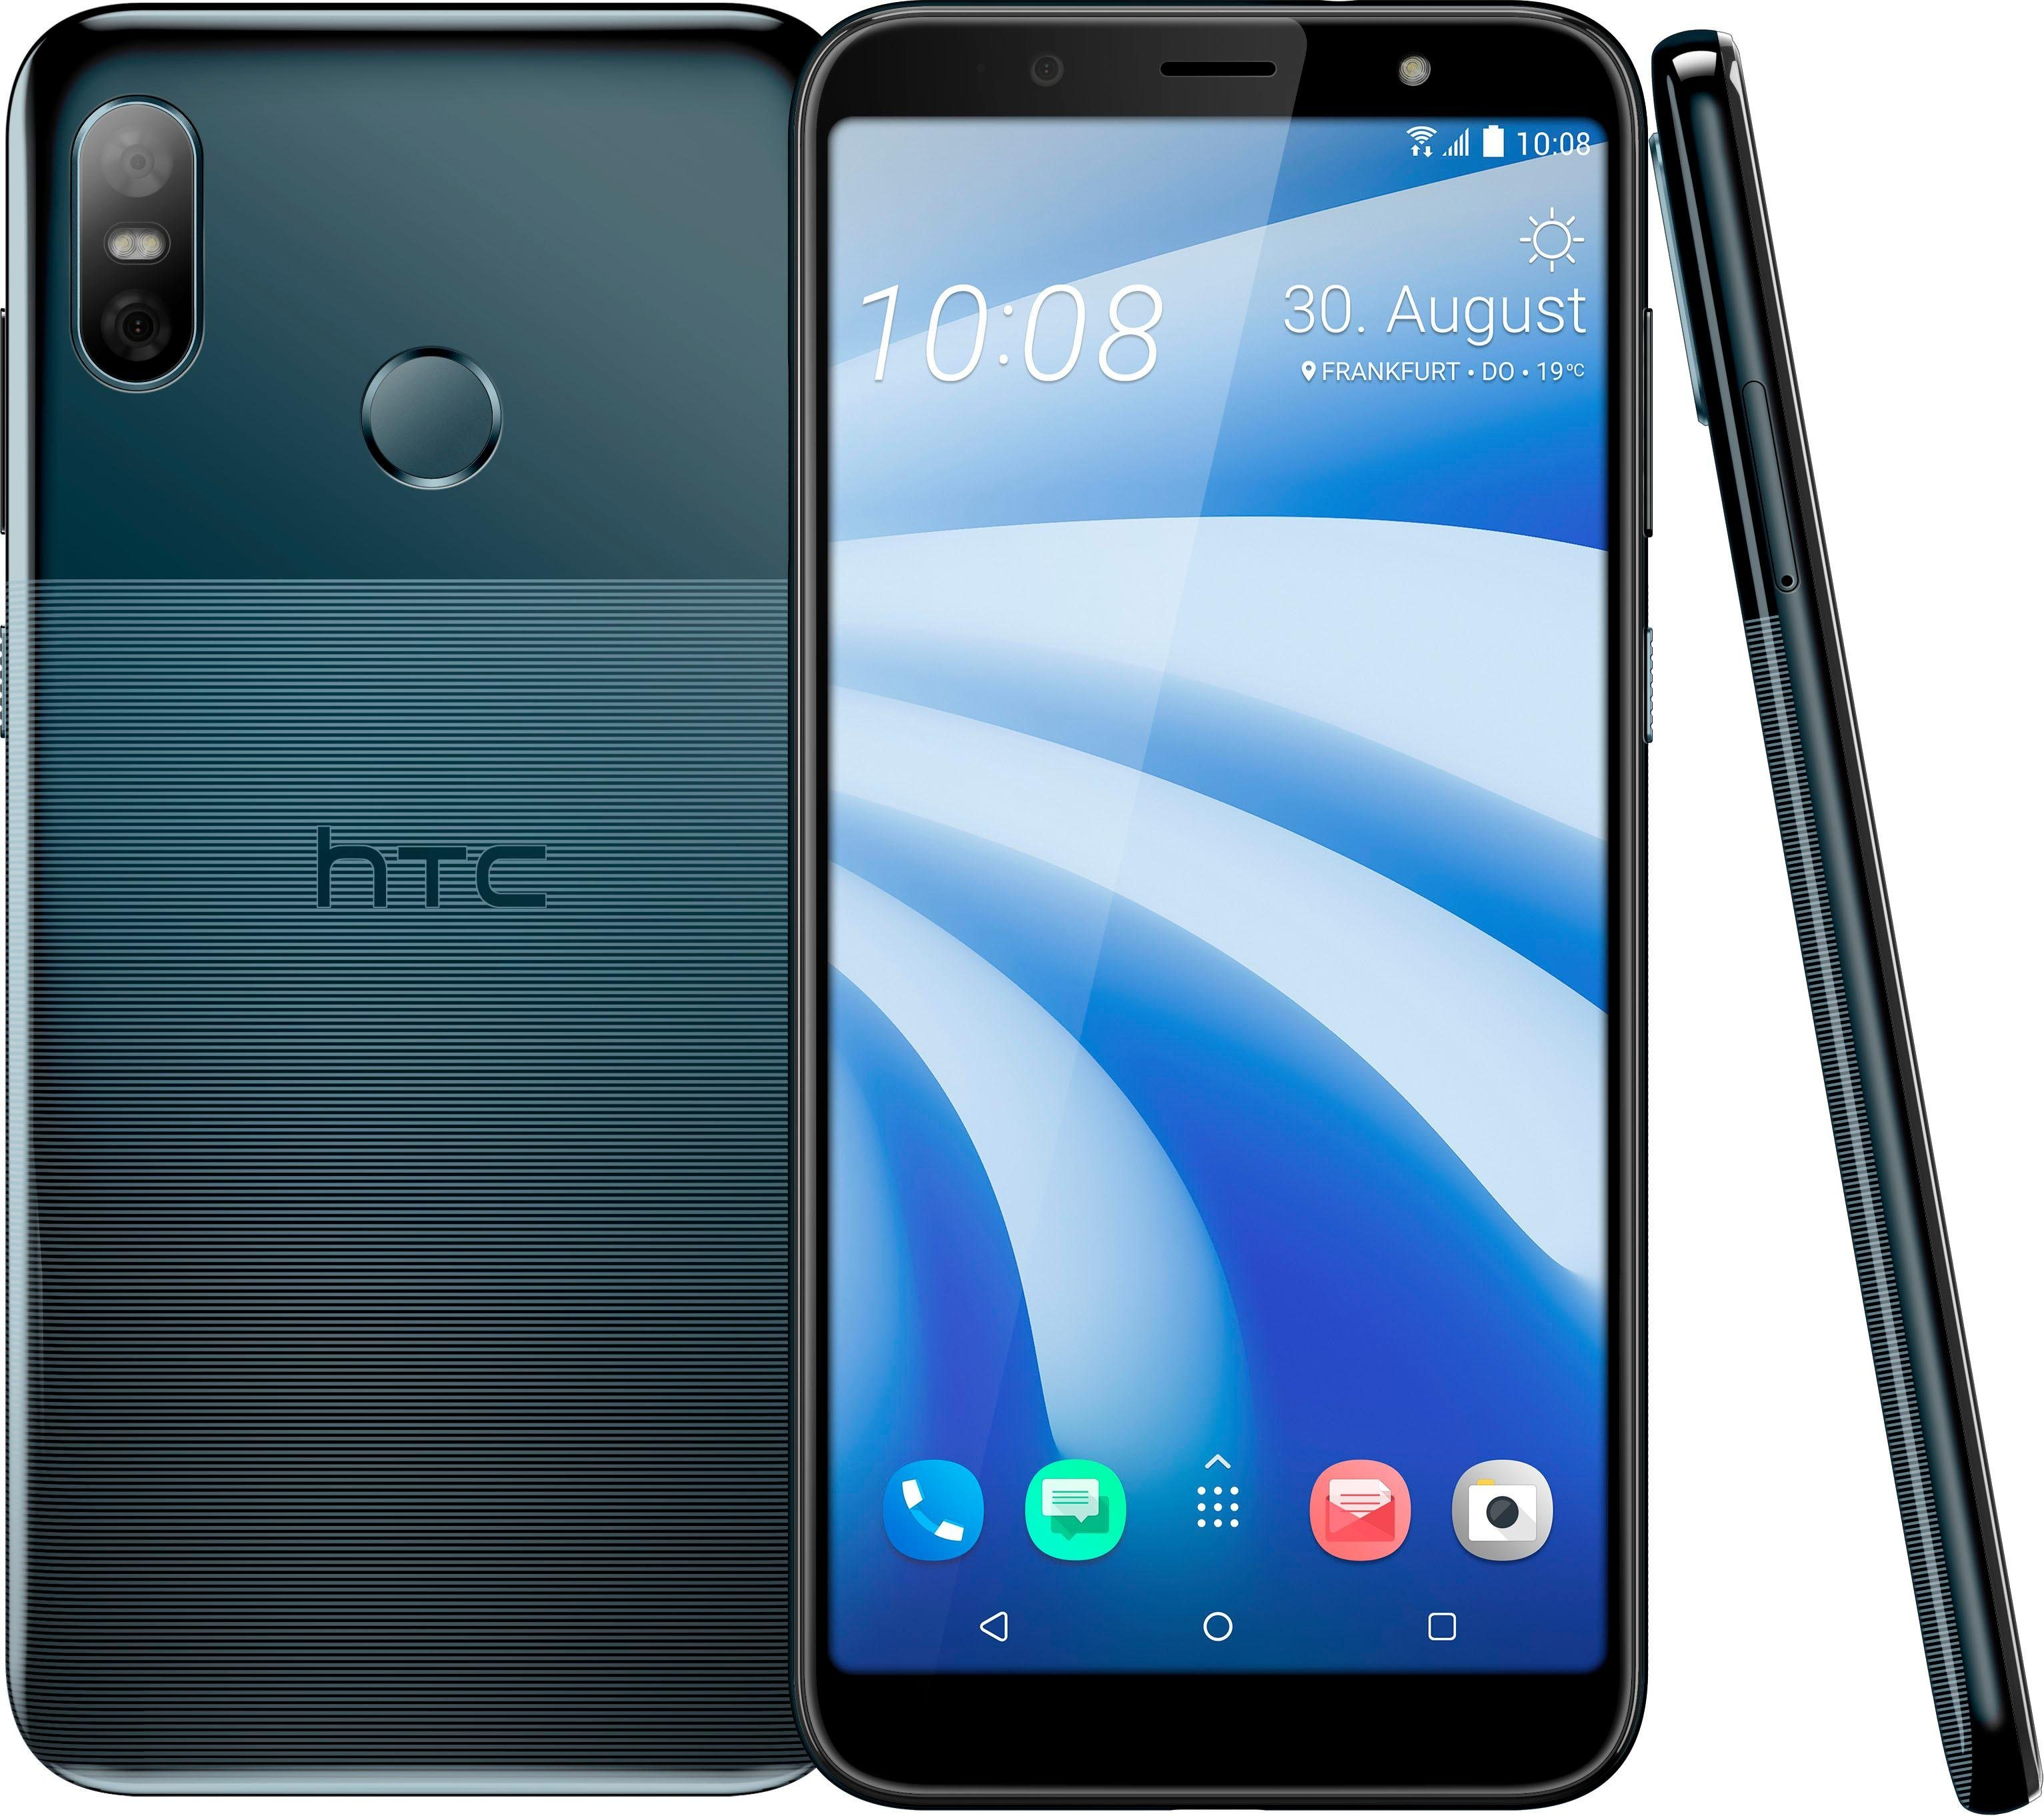 U12 life Smartphone (15,24 cm/6 Zoll, 64 GB Speicherplatz, 16 MP Kamera)